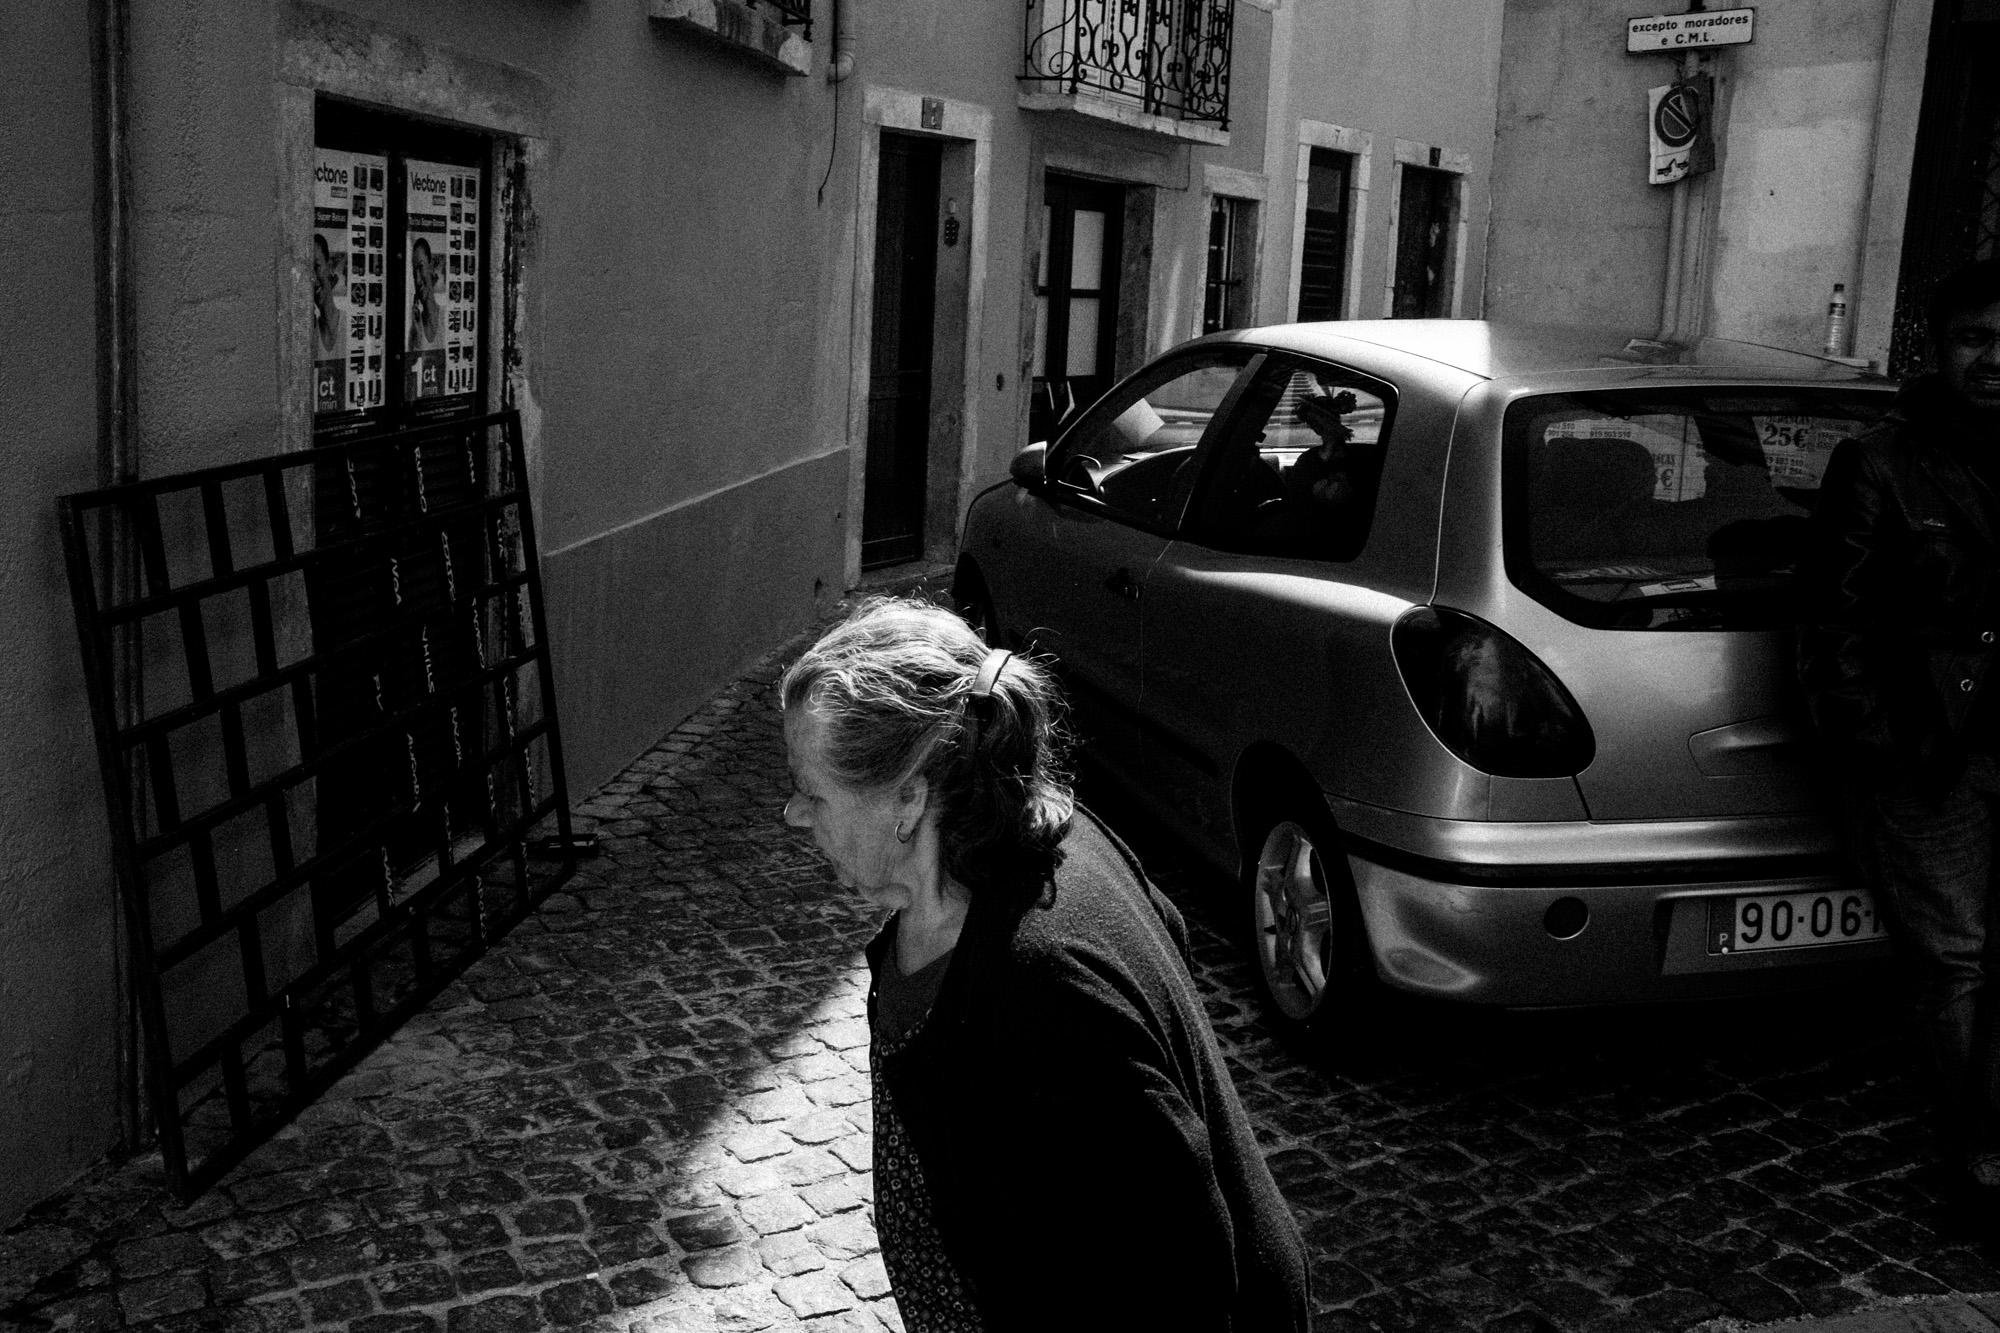 streets-of-lisbon-13.jpg